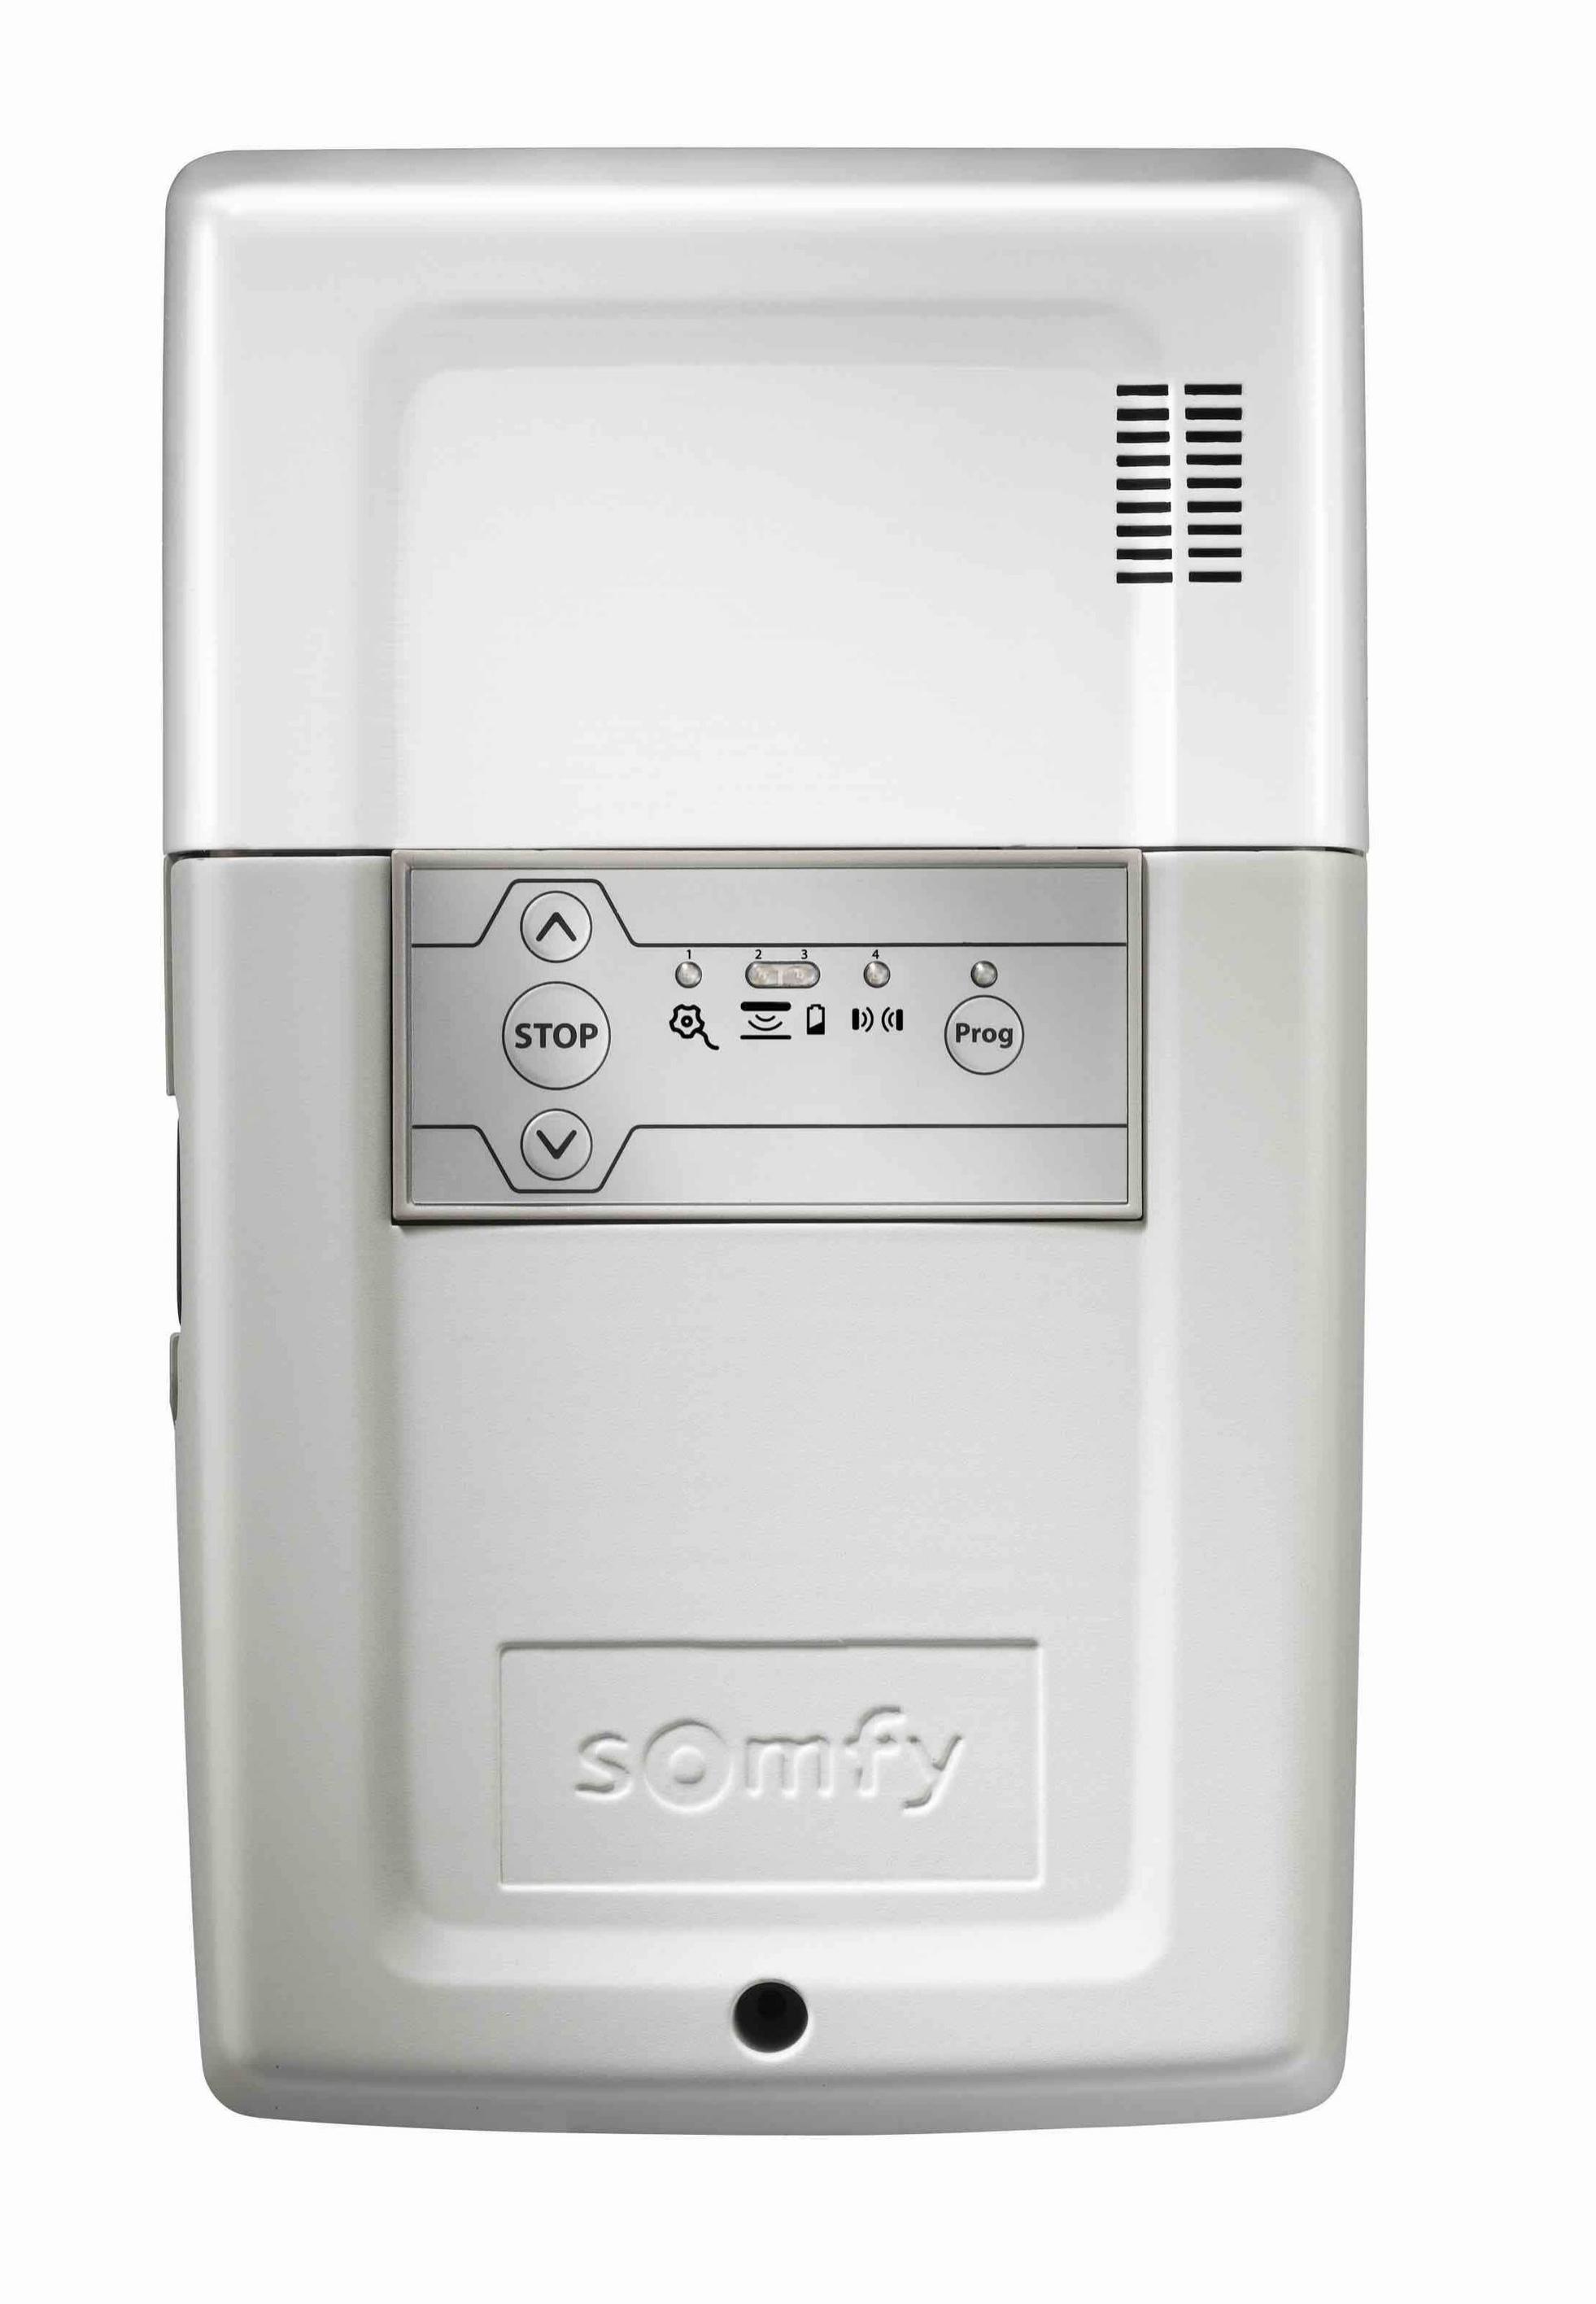 Somfy Control Panel Resized.jpg